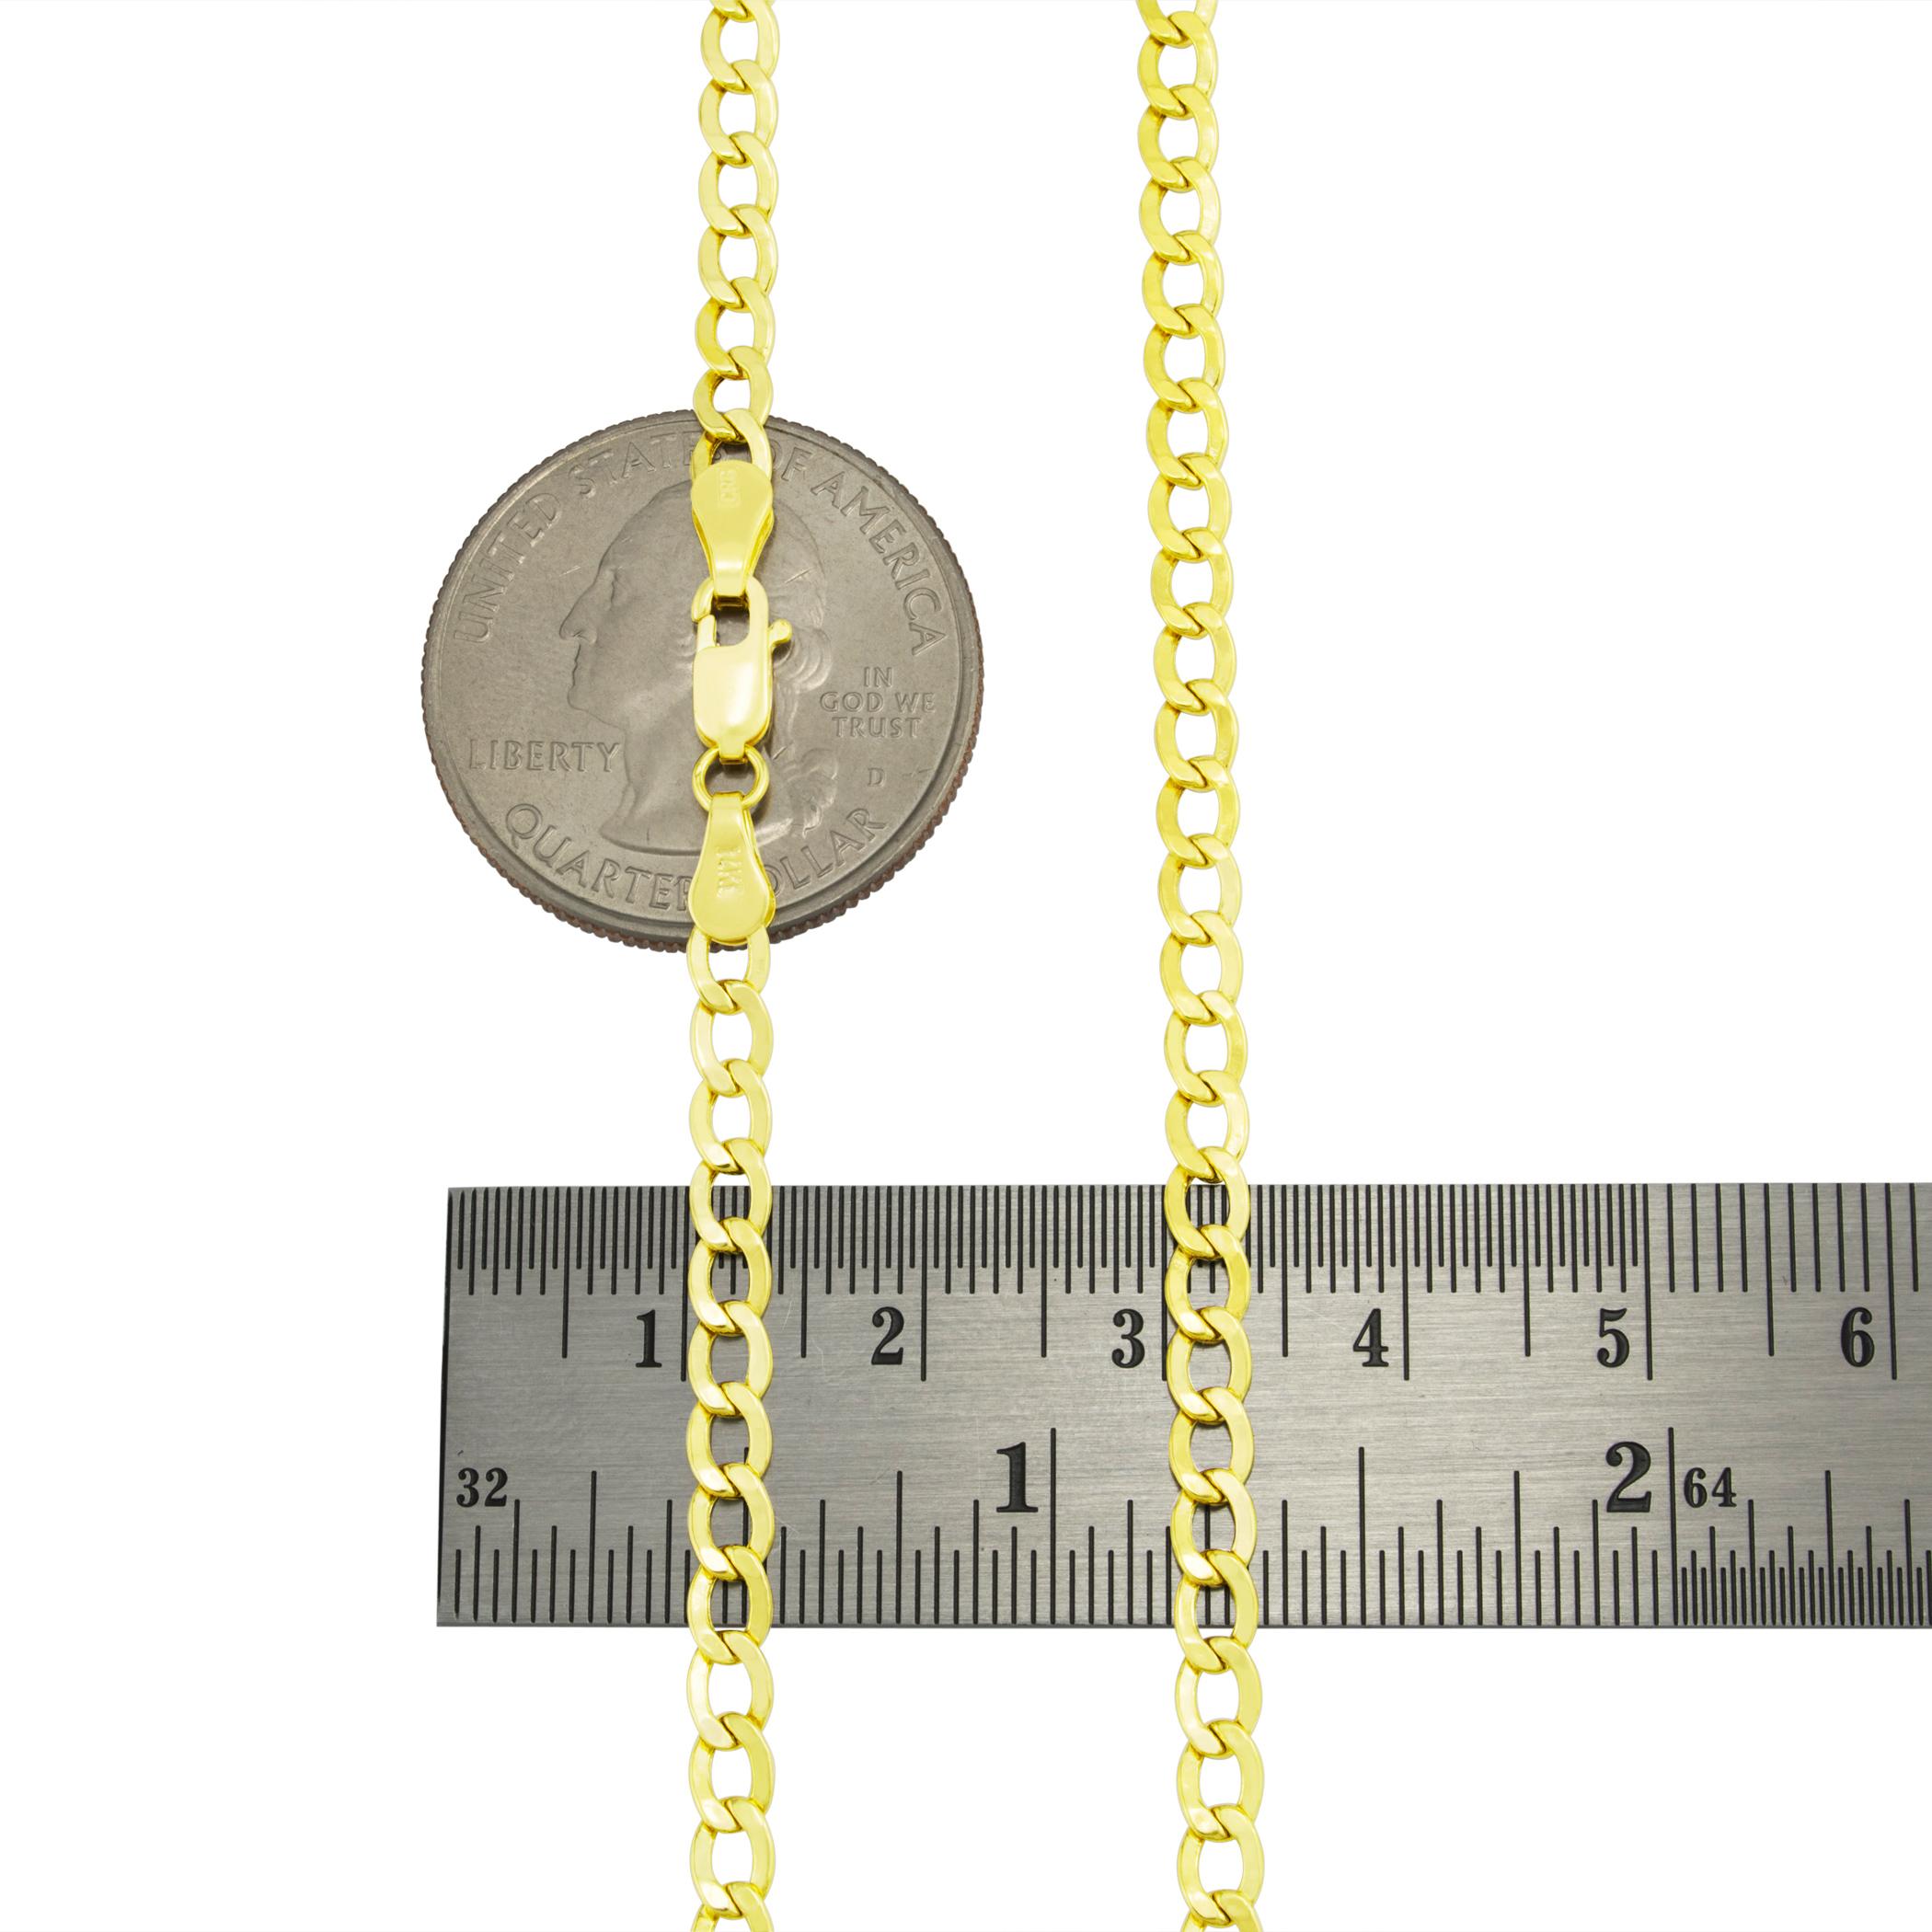 14K-Real-Yellow-Gold-3-5mm-6-5mm-Cuban-Curb-Chain-Link-Bracelet-Men-Women-7-034-9-034 thumbnail 12